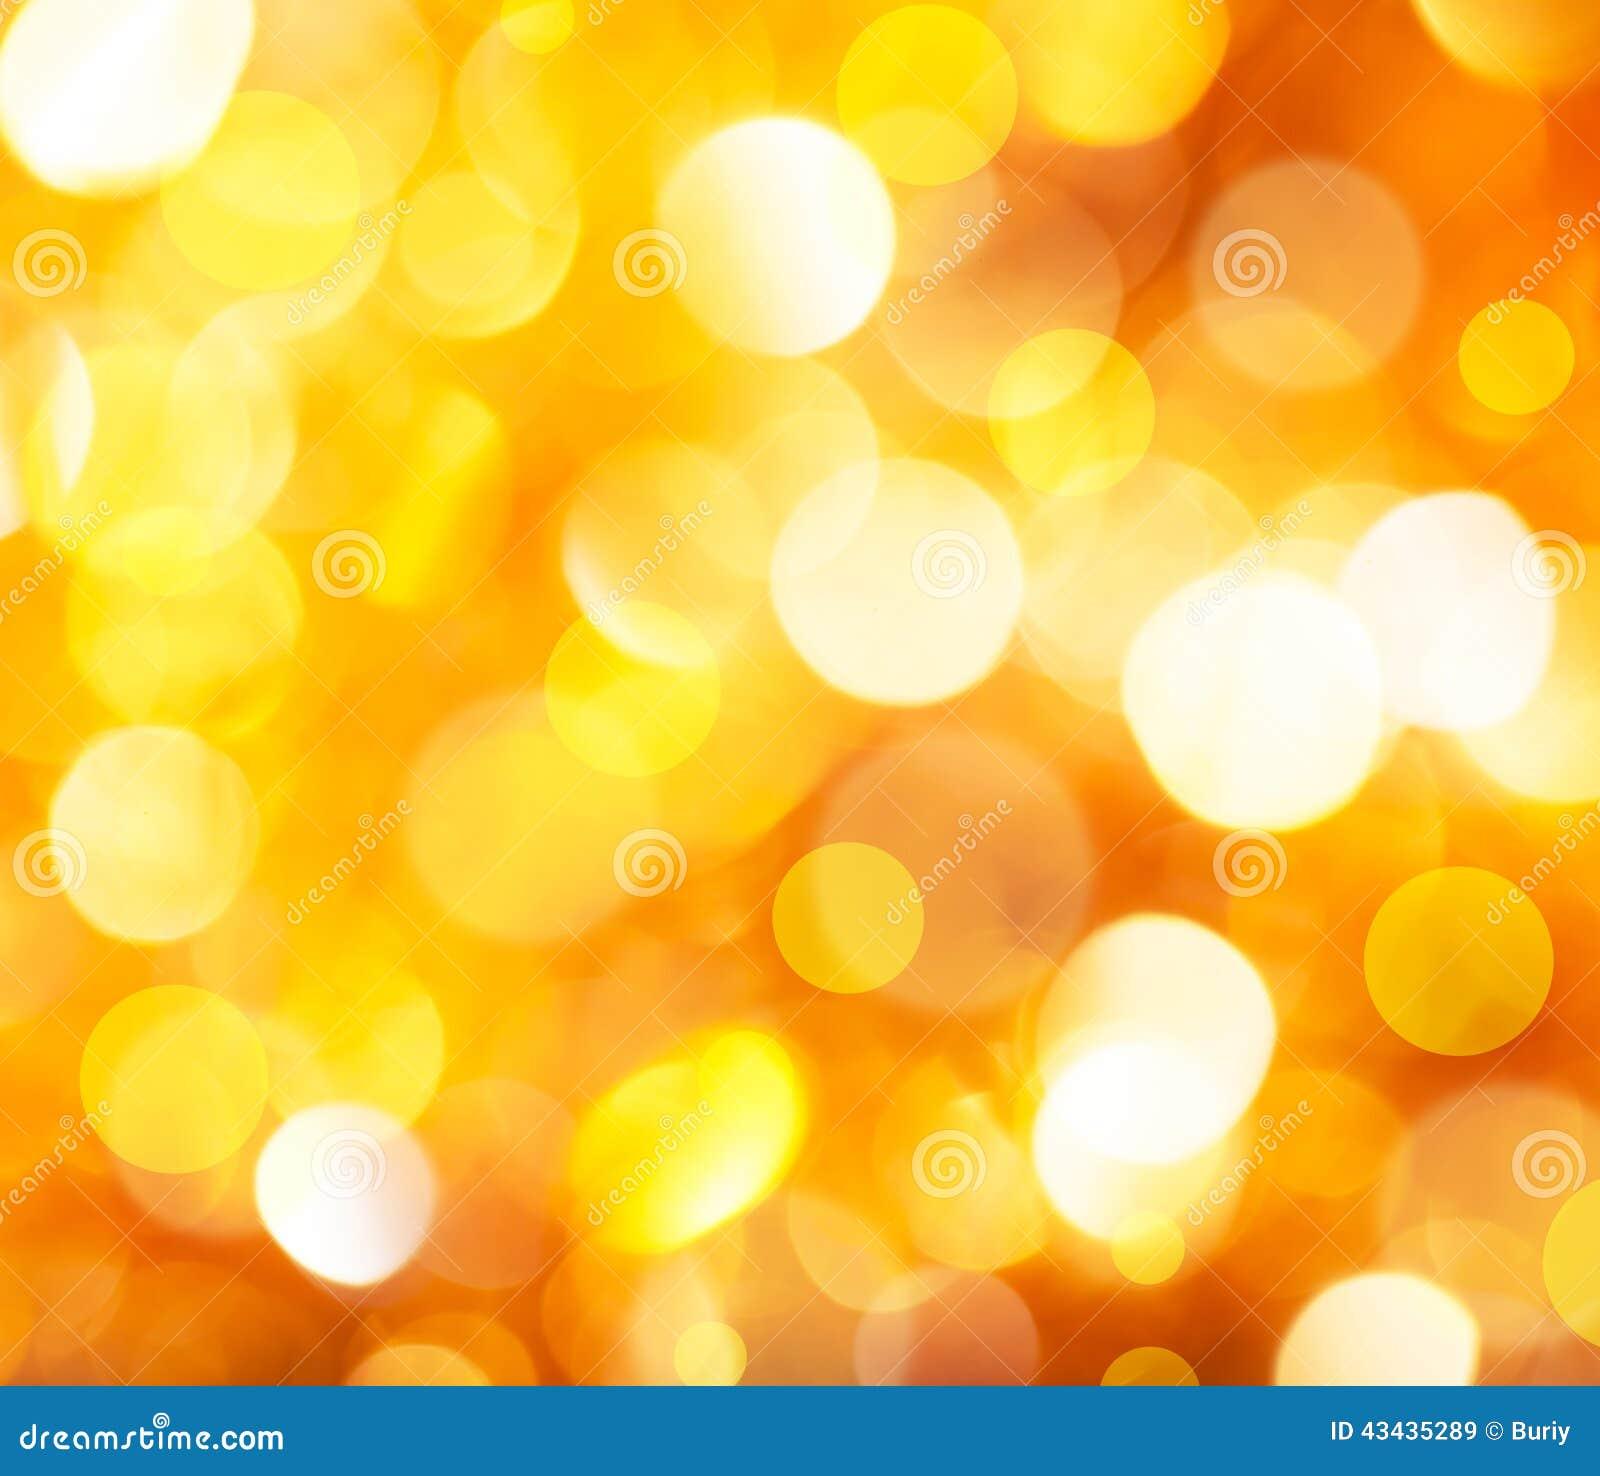 shiny golden lights stock - photo #21